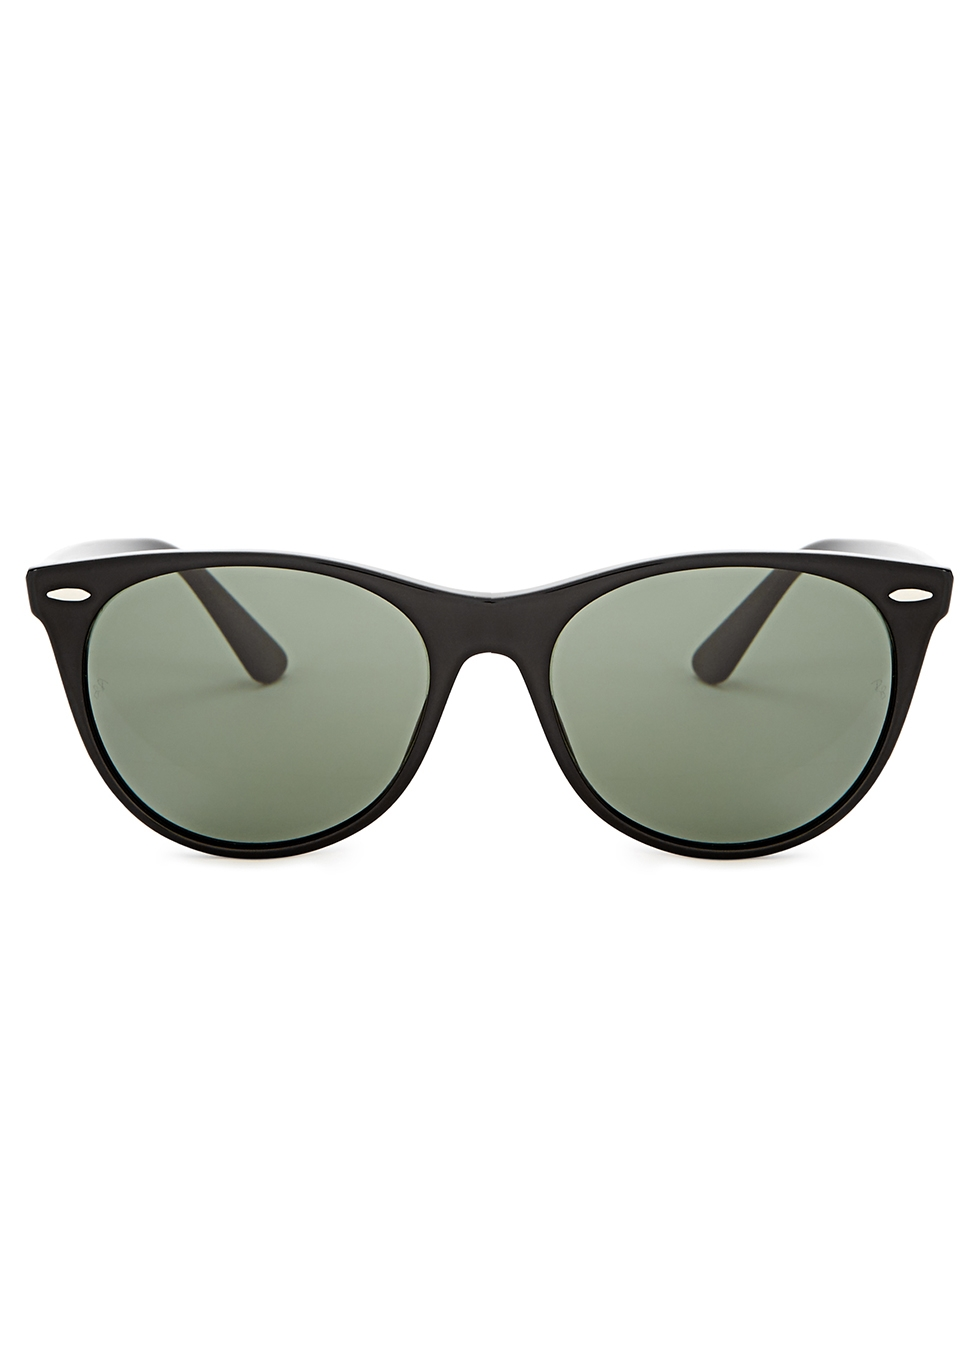 Black wayfarer sunglasses - Ray-Ban